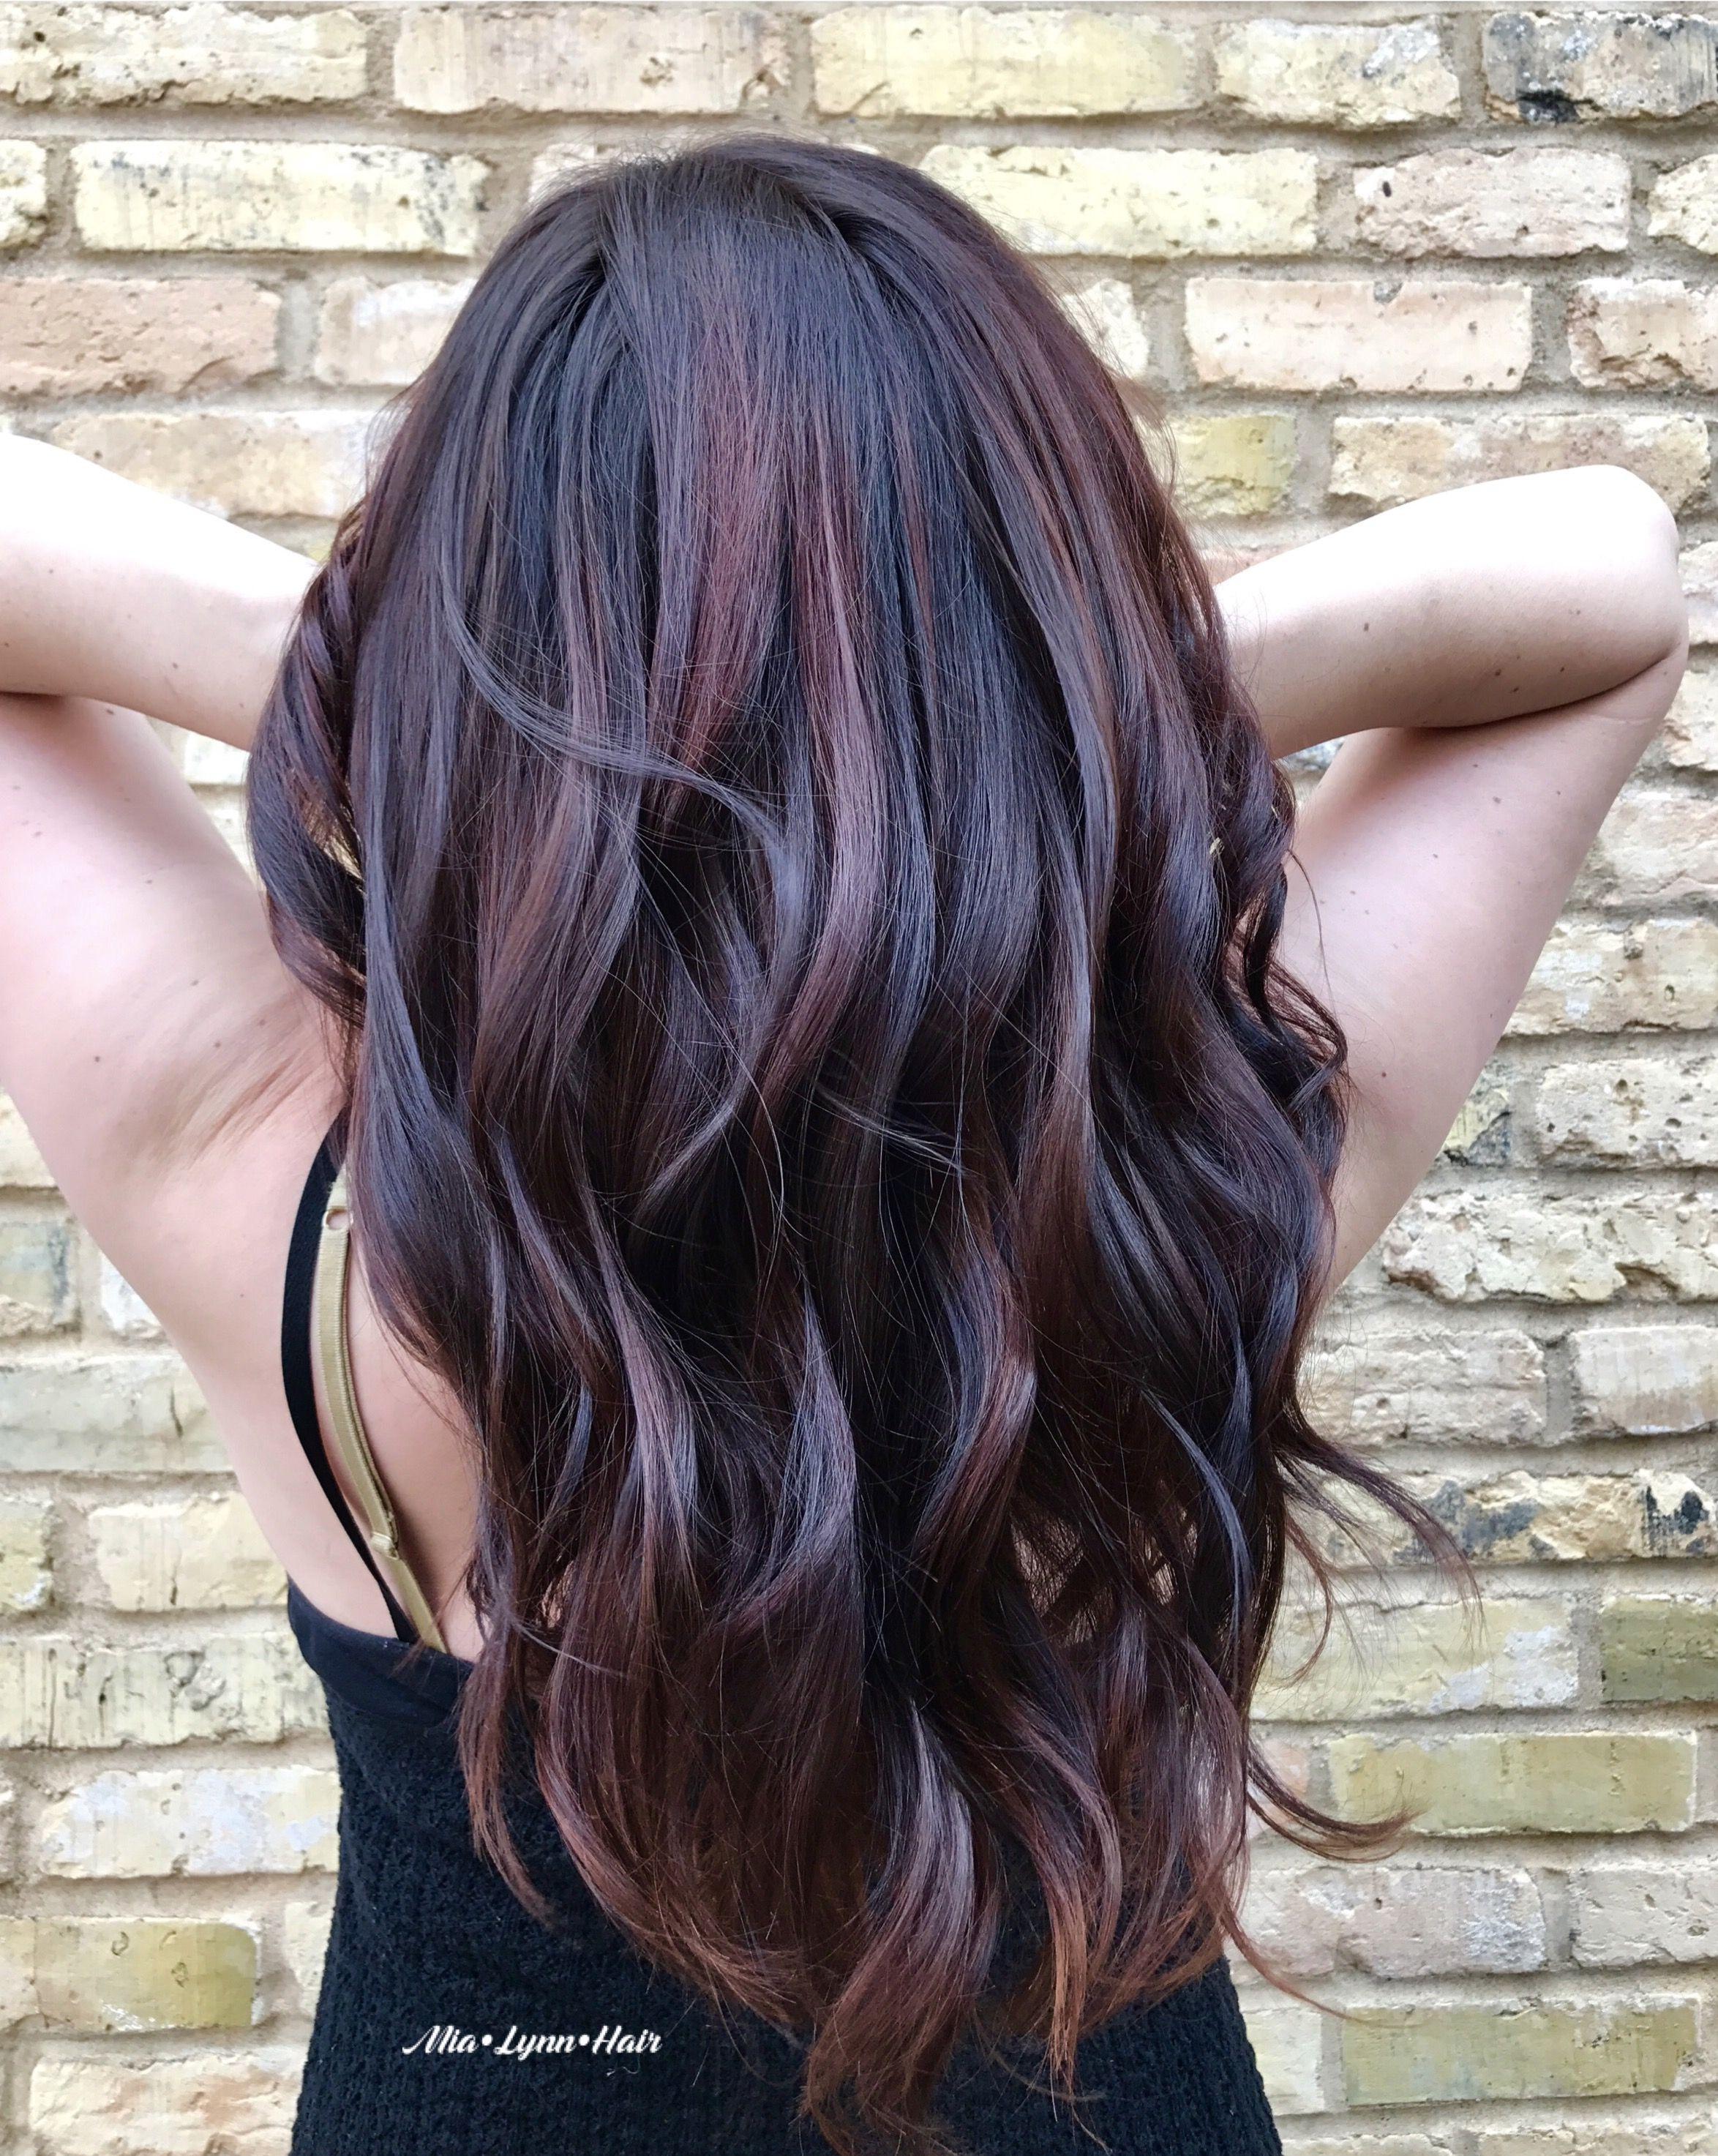 Ballayage Blond en ce qui concerne red hair, auburn hair, dimensional red, balayage, red balayage, face